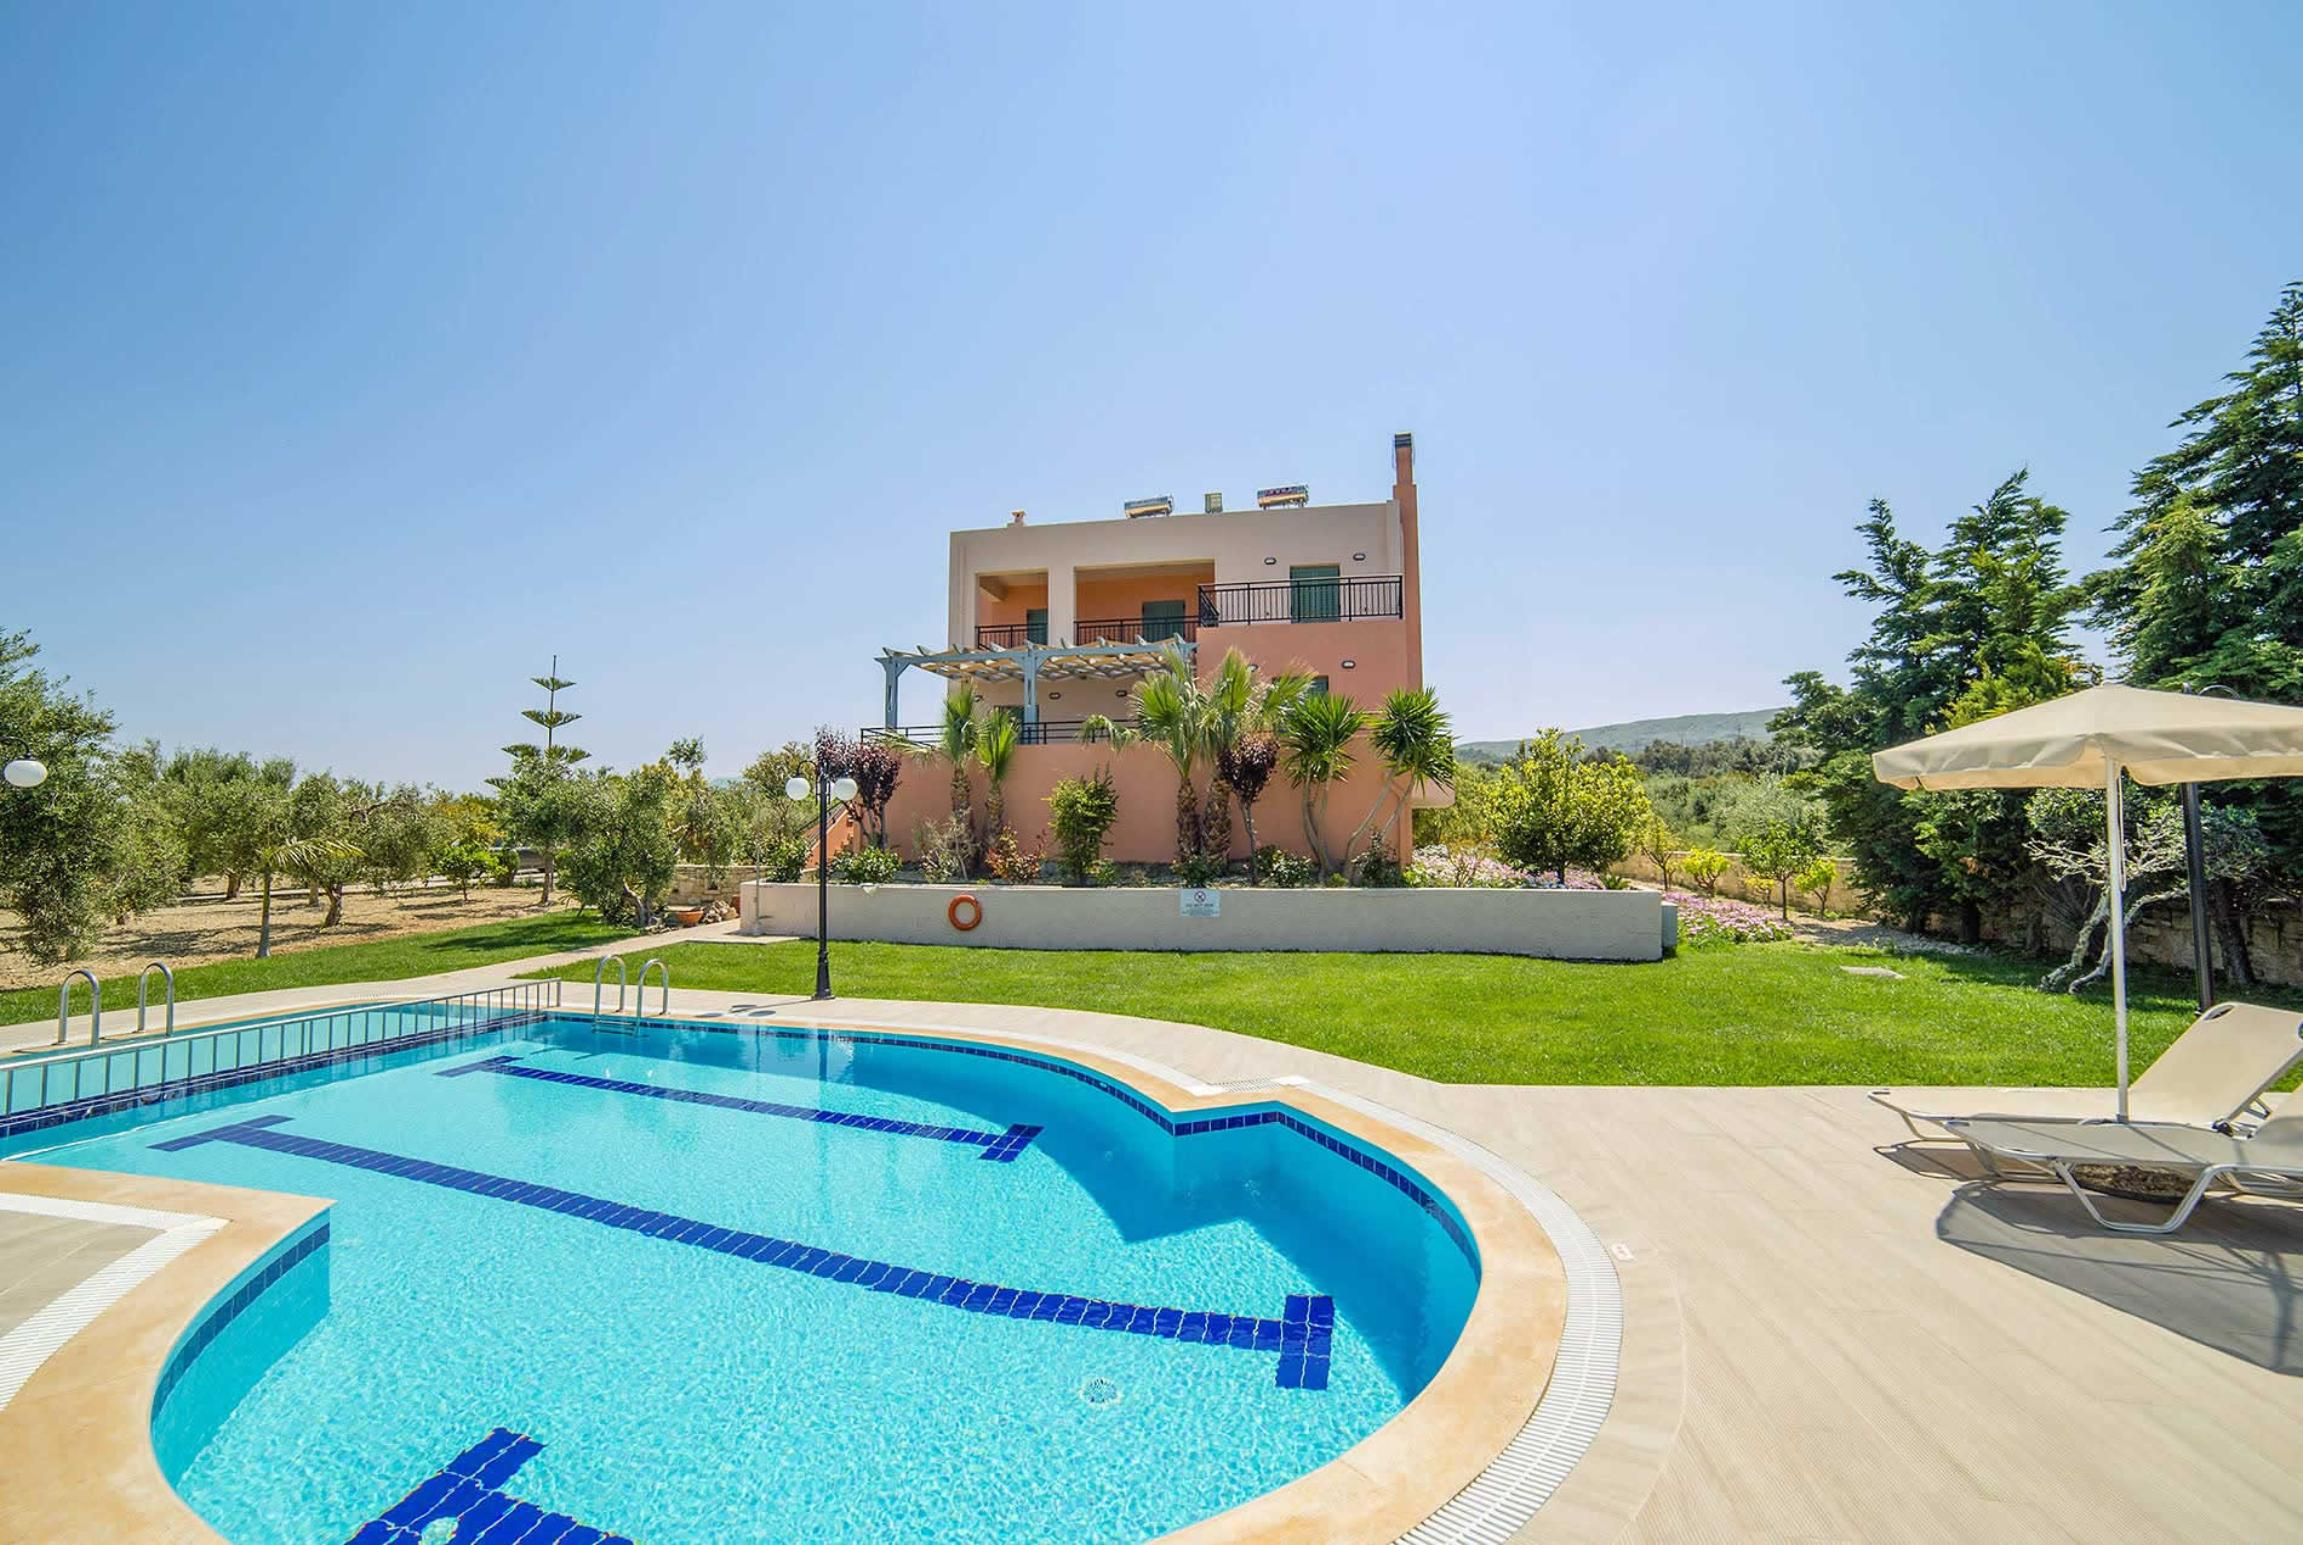 Ferienhaus Kyveli (2654321), Rethymno, Kreta Nordküste, Kreta, Griechenland, Bild 2